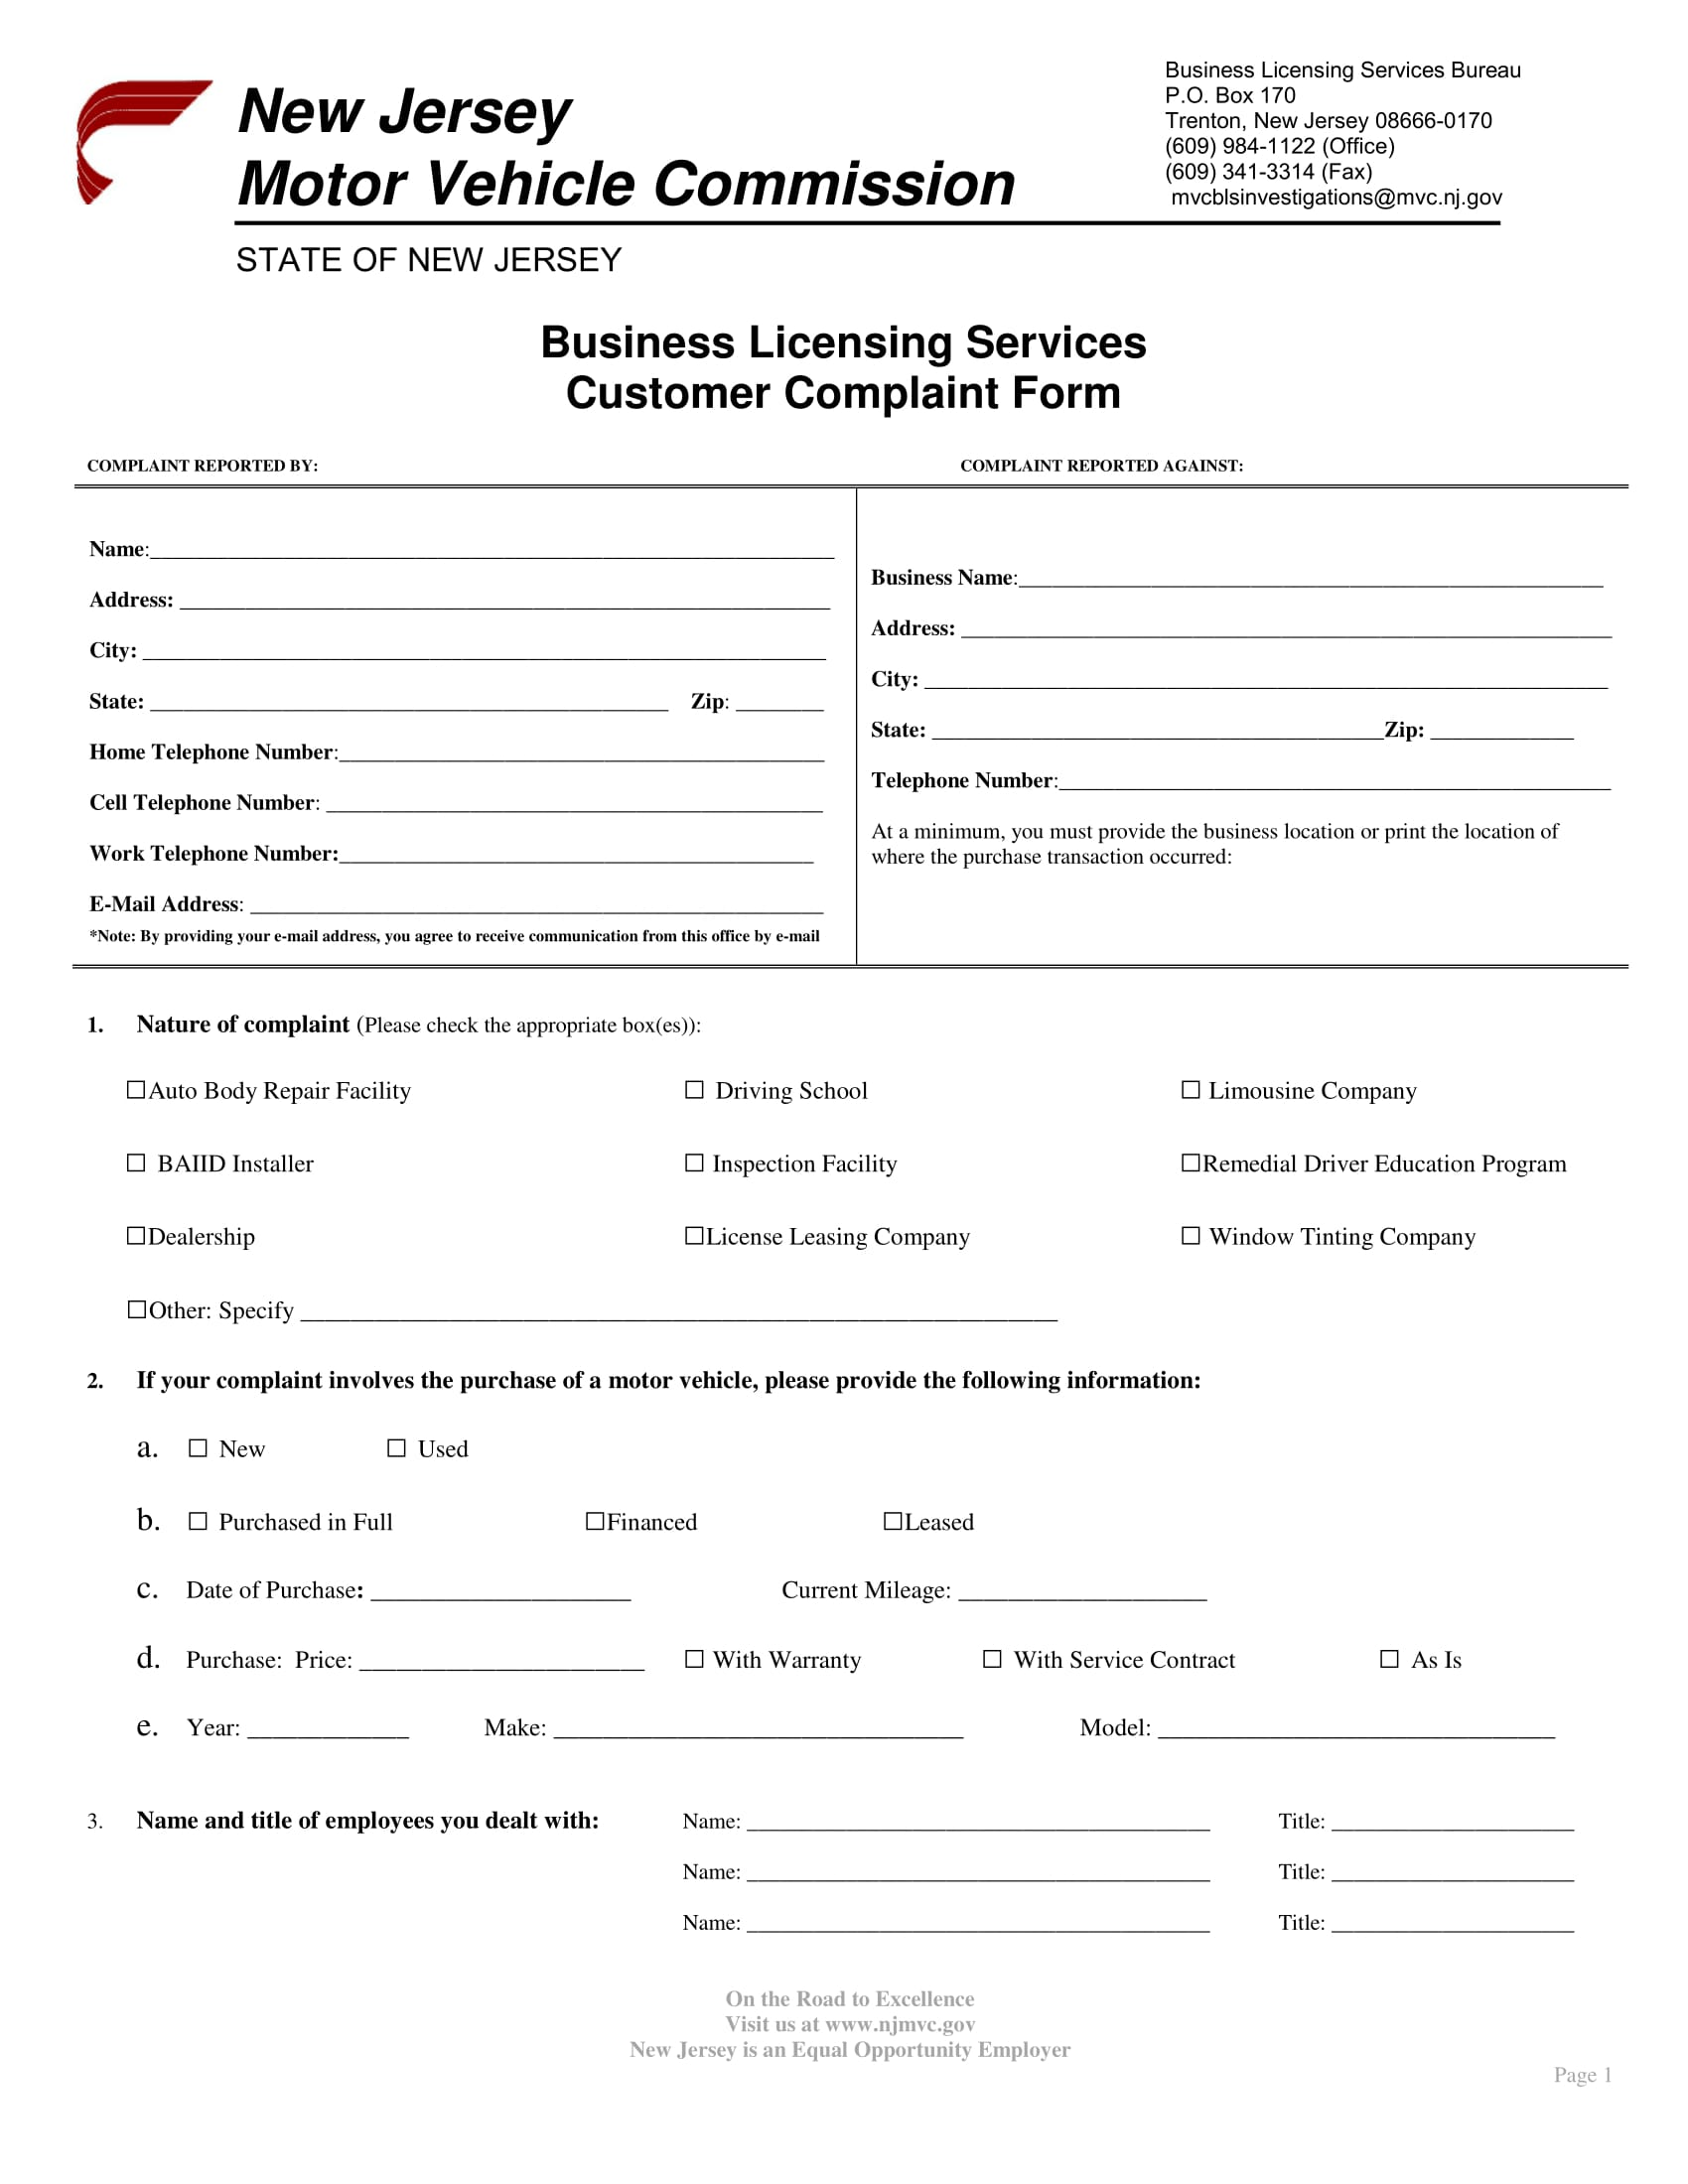 9 Business Complaint Form Free Word PDF Format Download – Financial Ombudsman Service Complaint Form